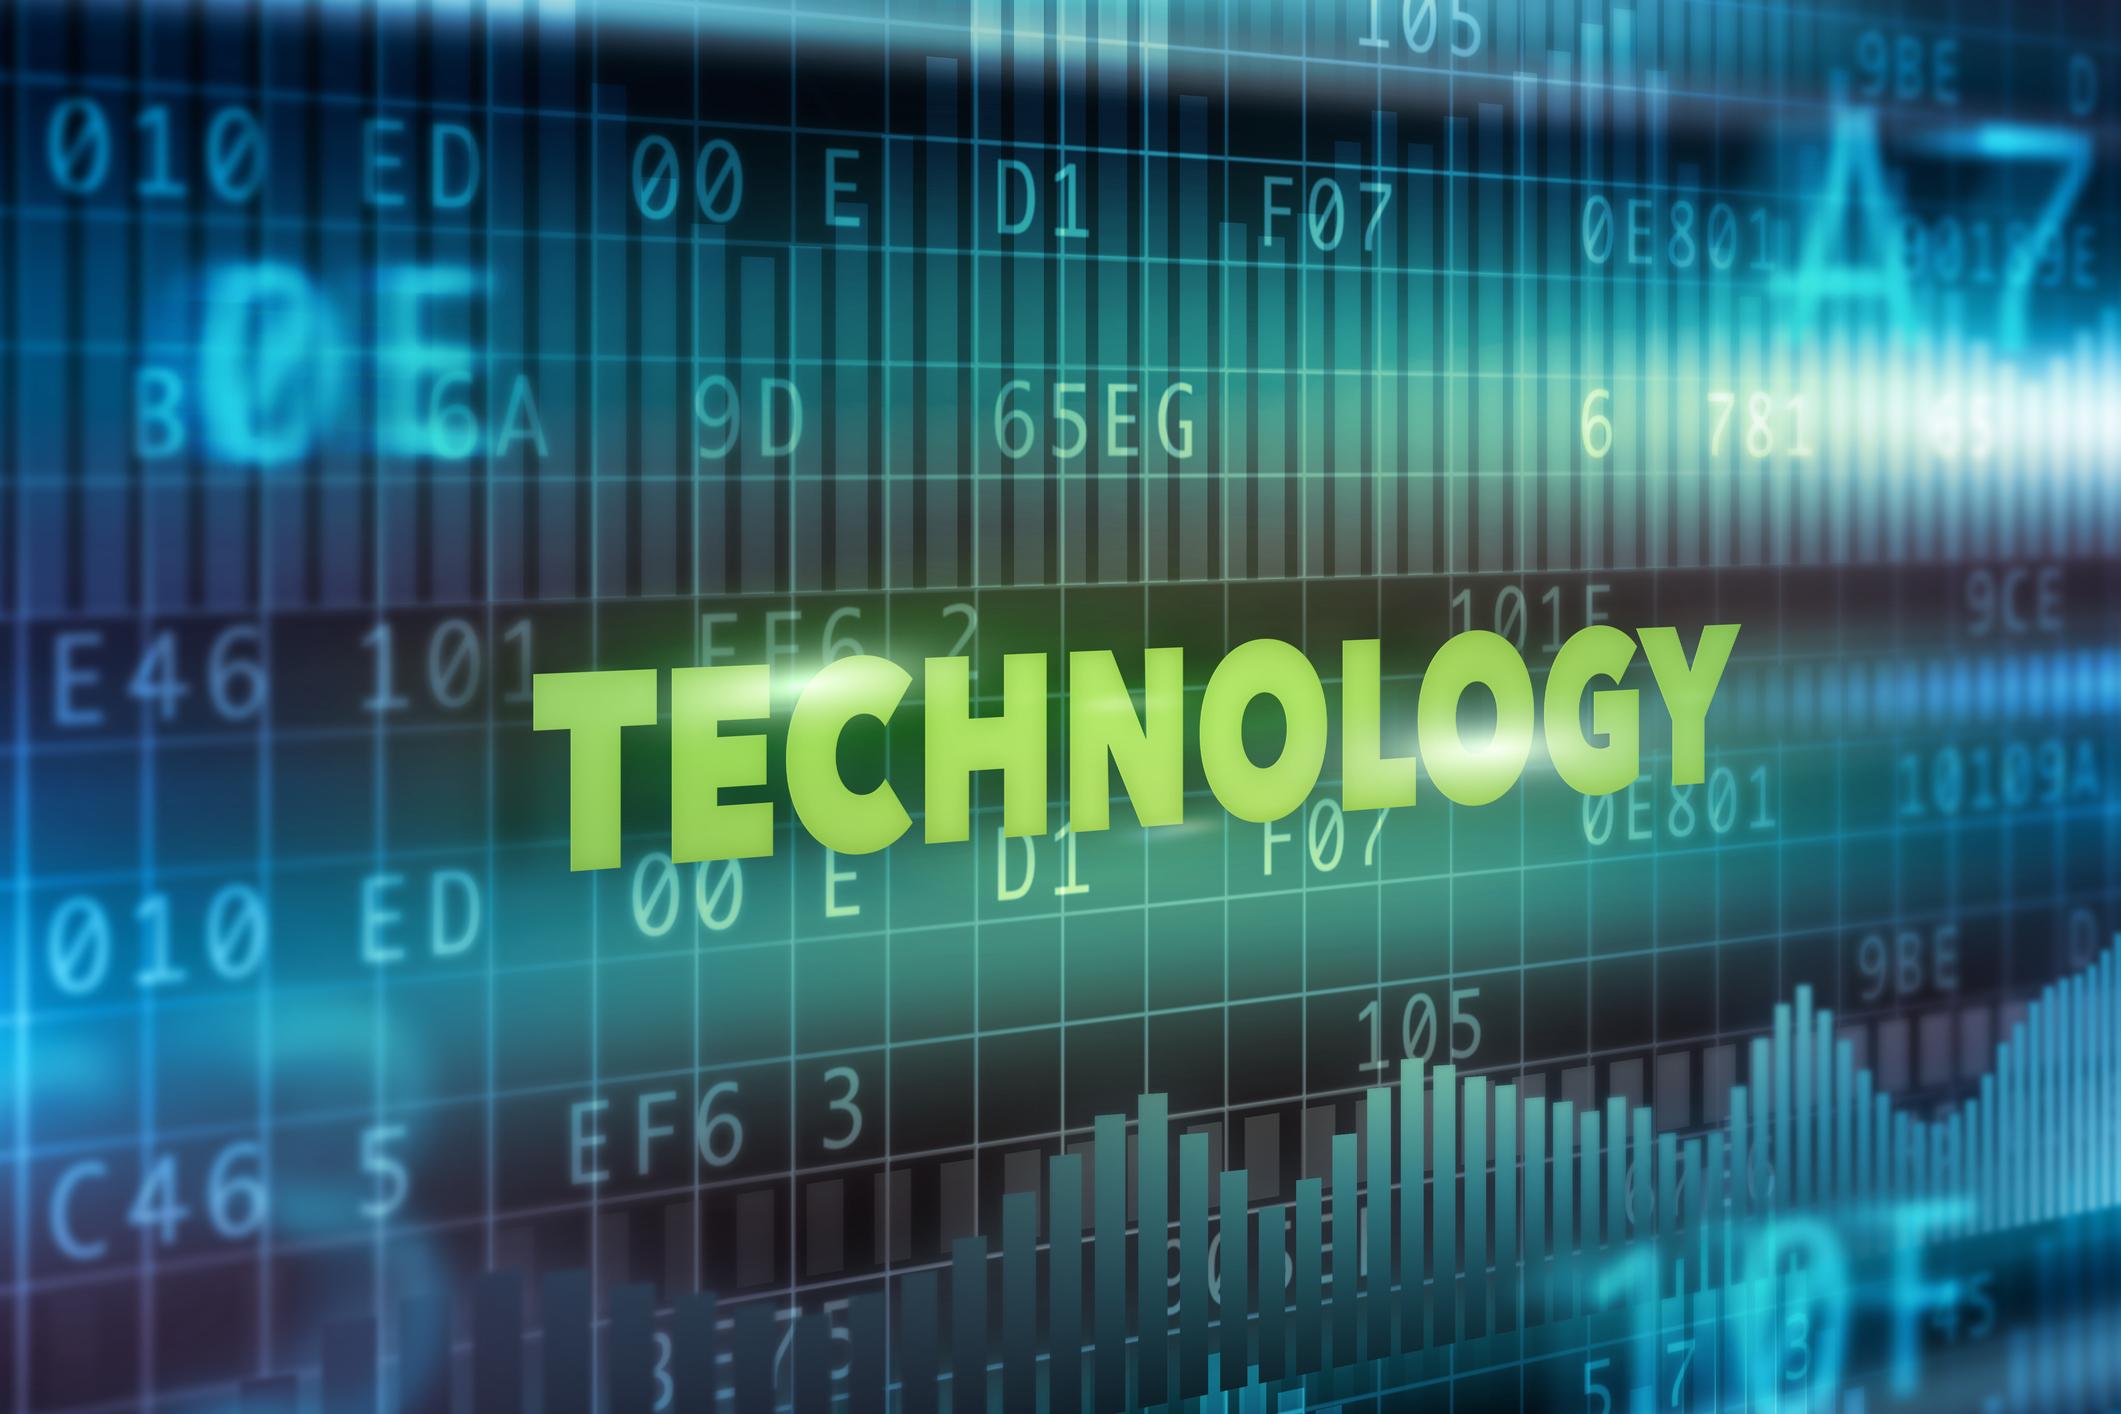 Tech Stocks This Week: Netflix, Atlassian, and Microsoft Make Headlines